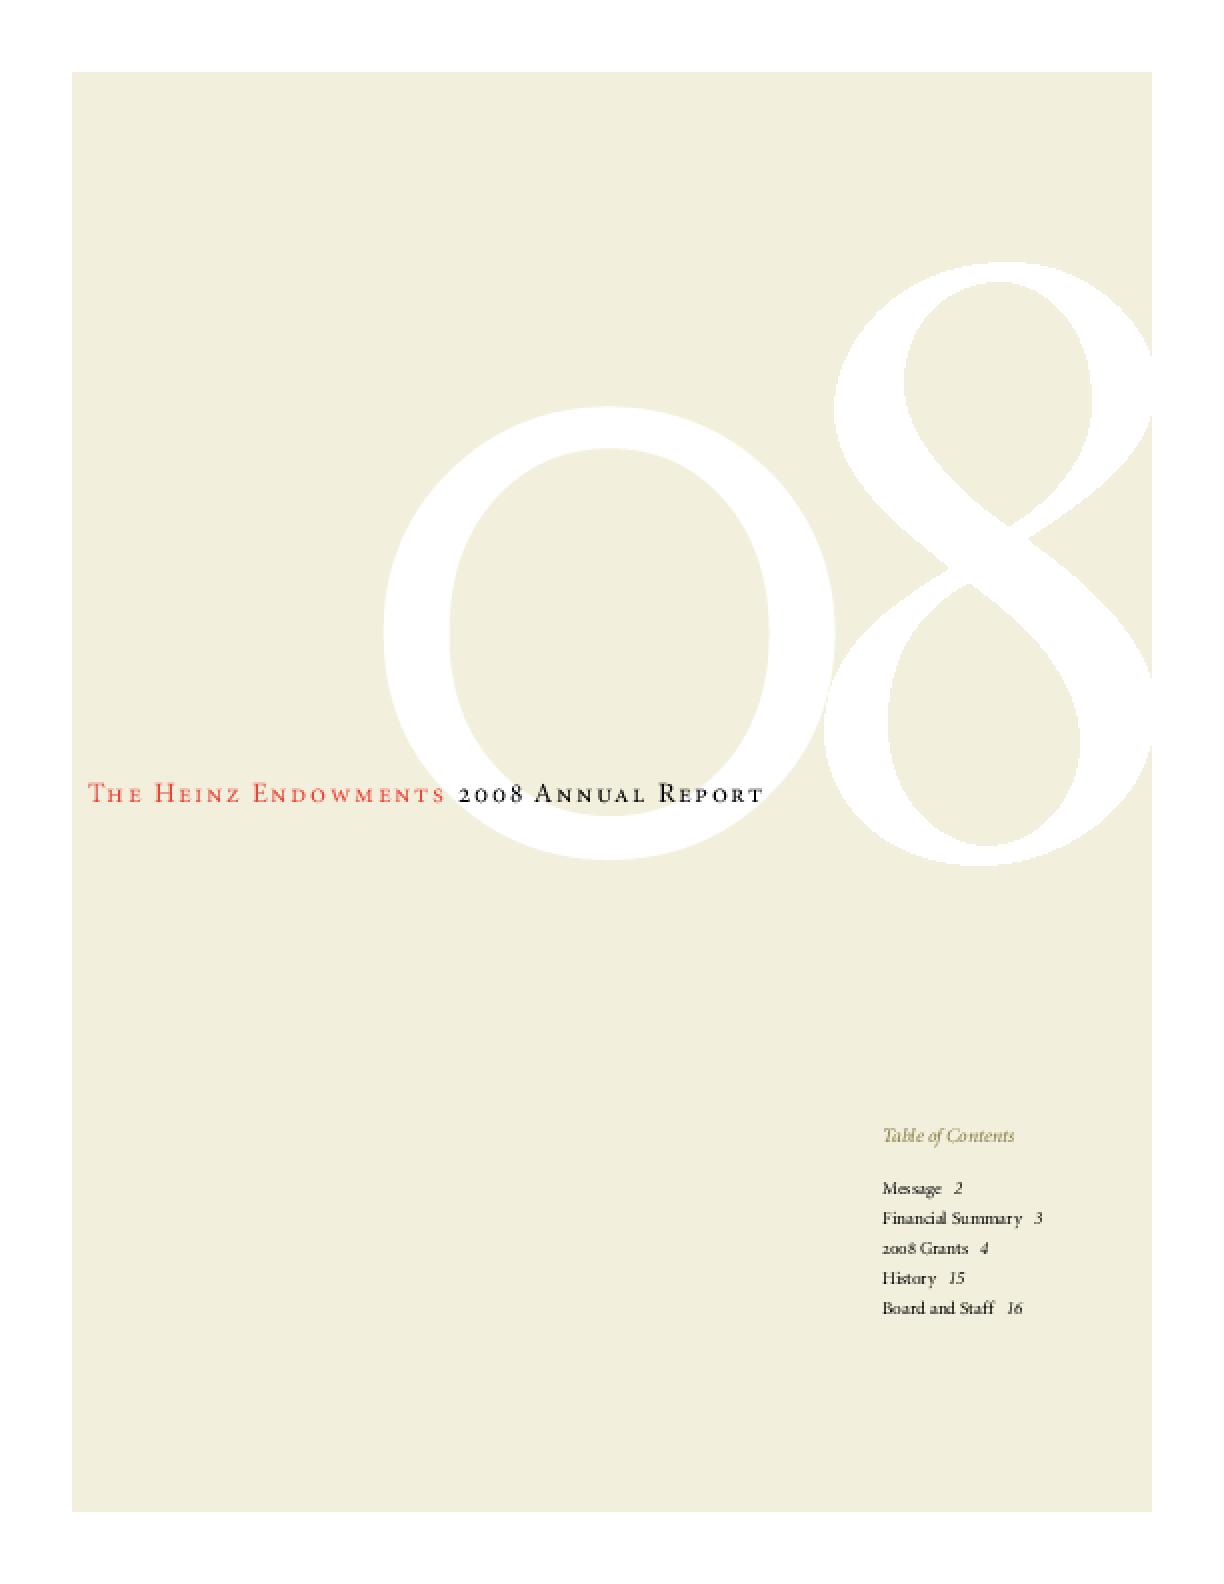 Heinz Endowments 2008 Annual Report